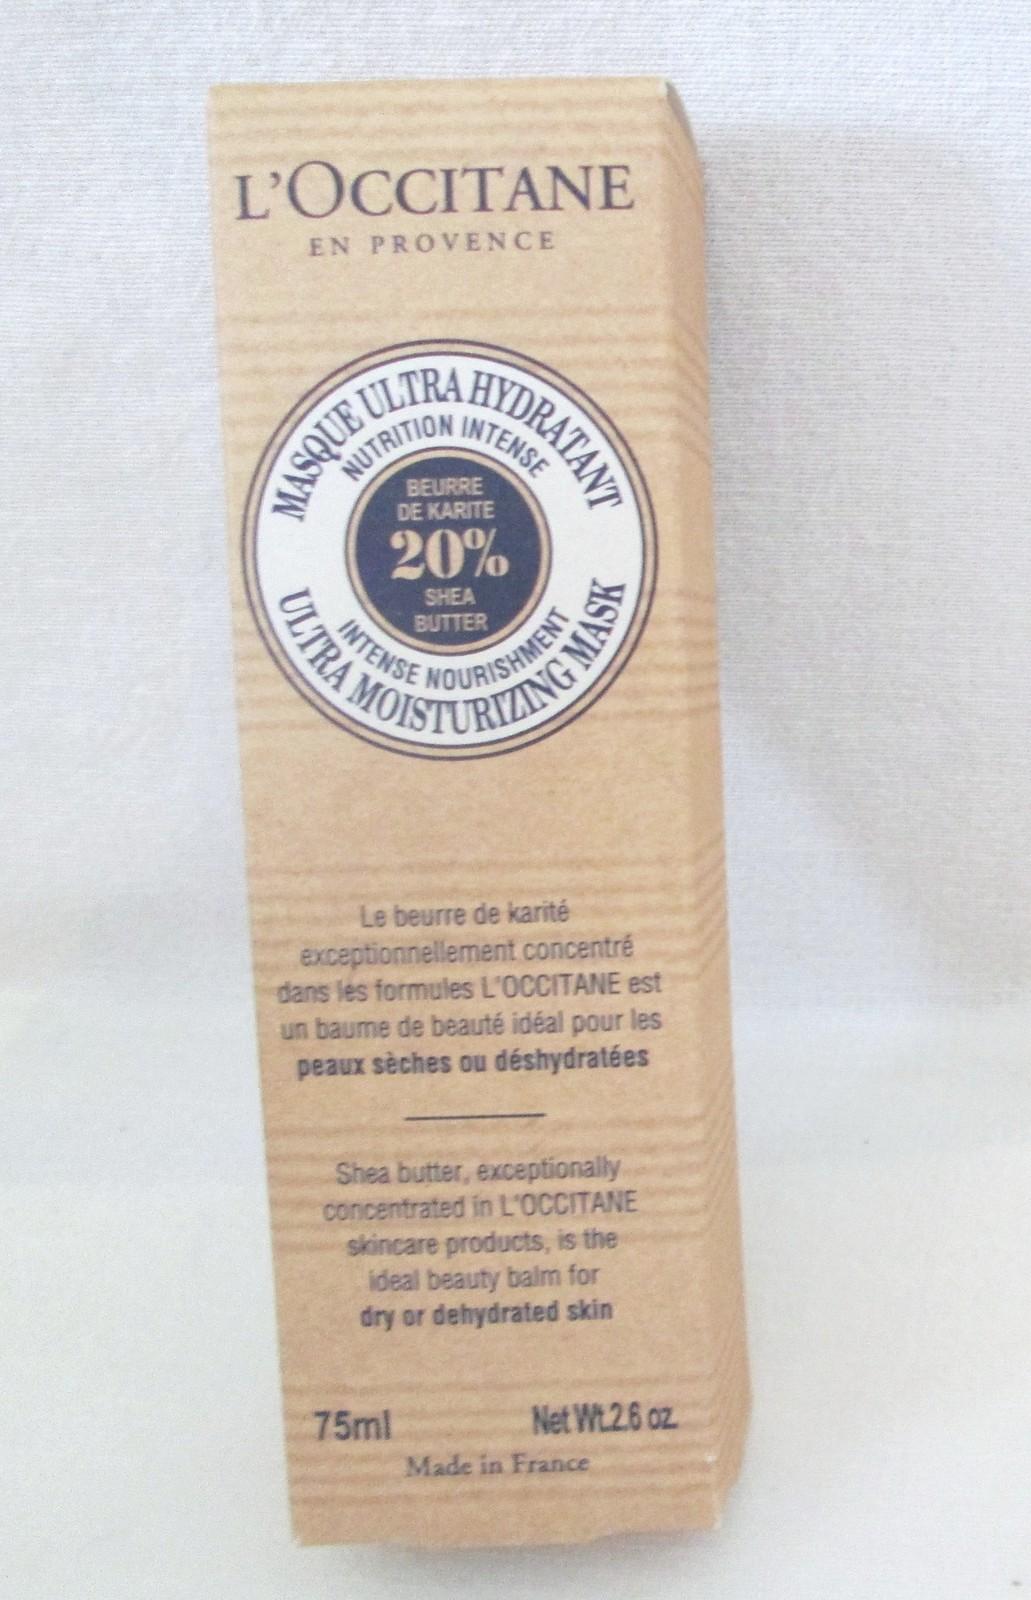 L'Occitane Ultra Moisturizing Mask 20% Shea. Boxed image 2